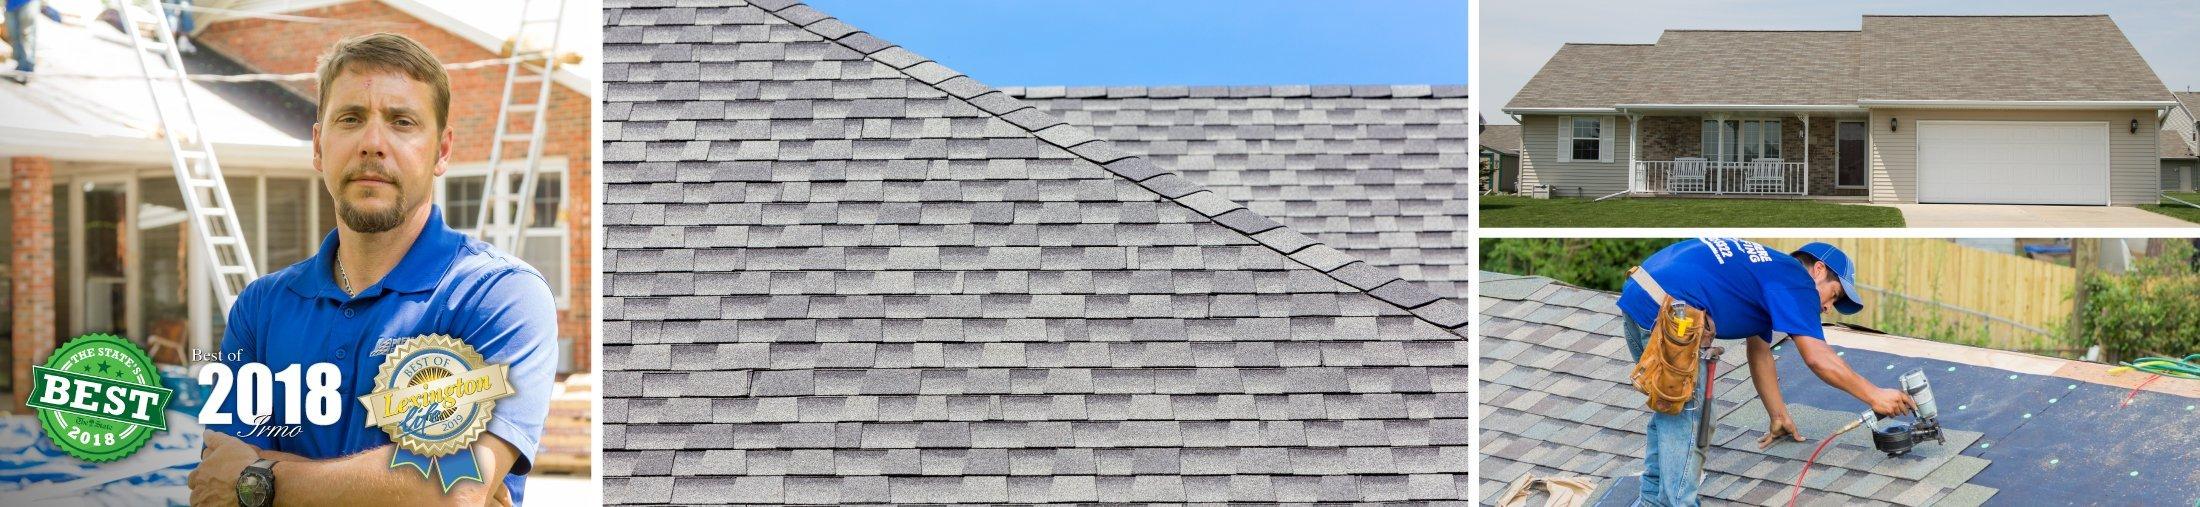 Premier Roofing